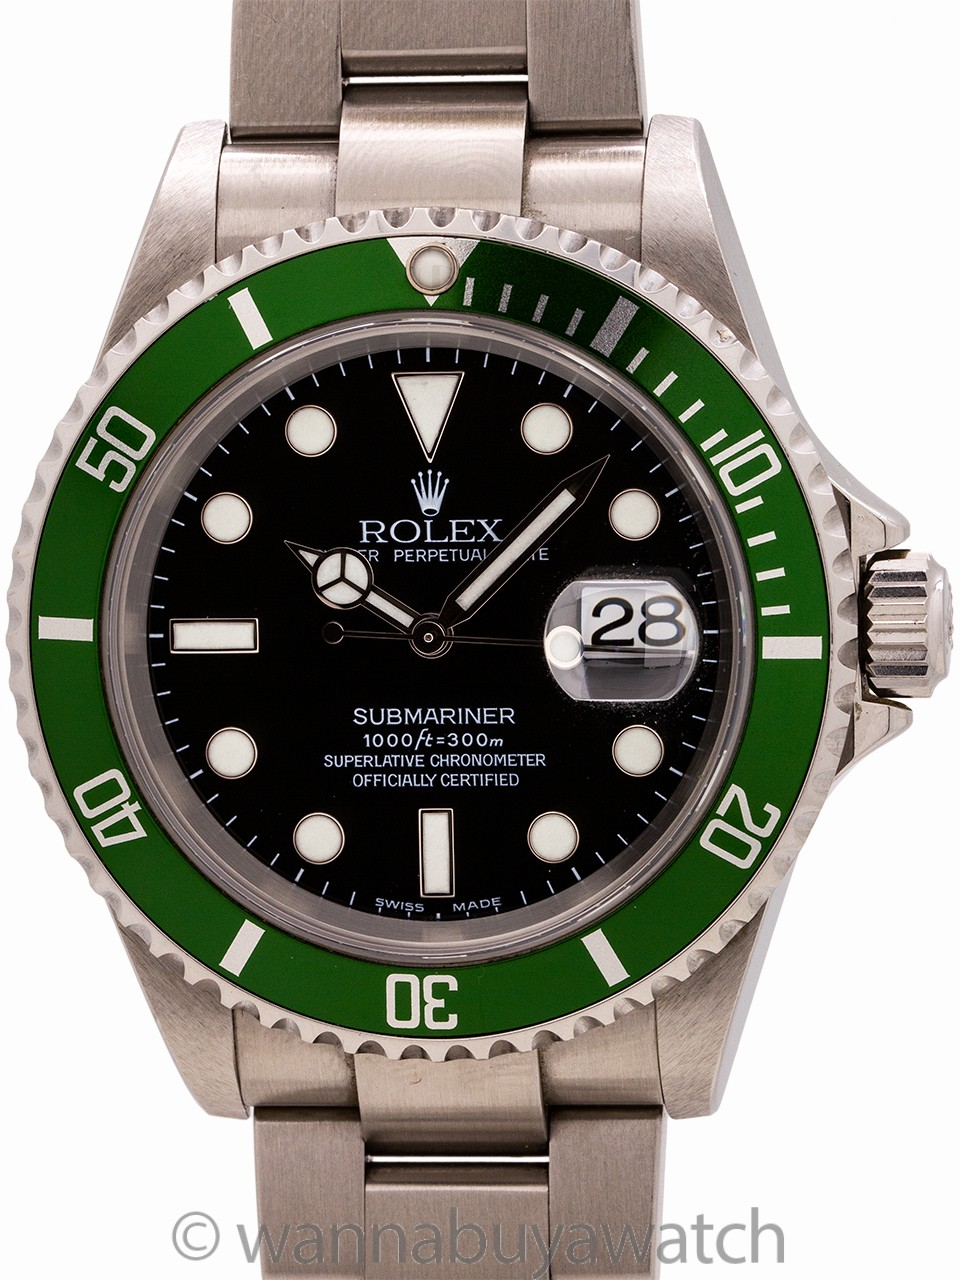 Wanna Buy A Watch